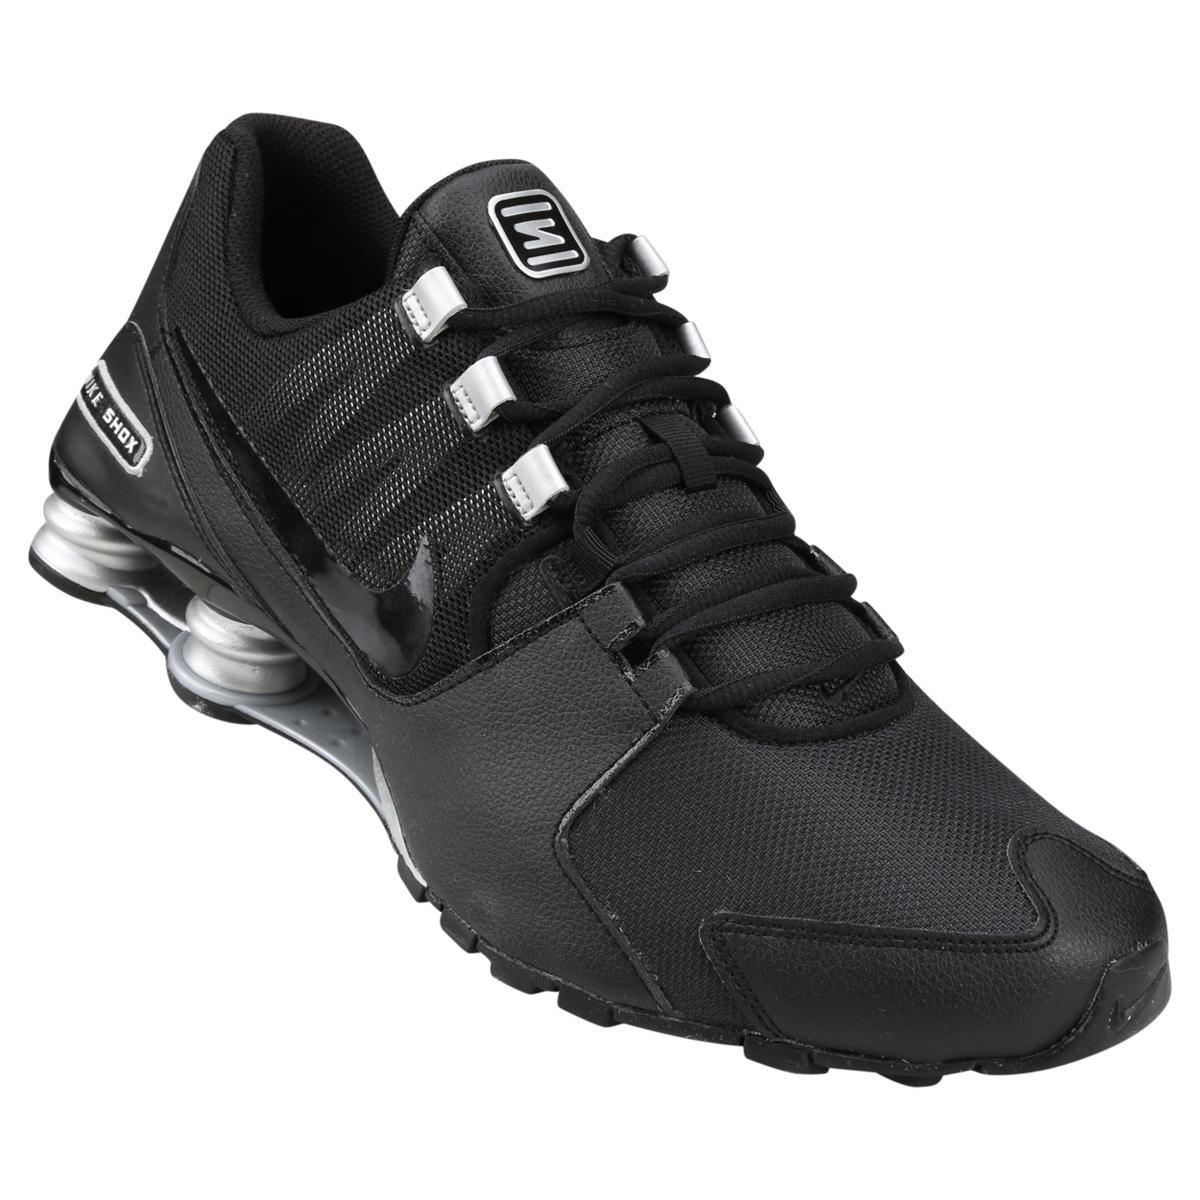 c4c1d46b255 Tênis Nike Shox Avenue Masculino - Compre Agora